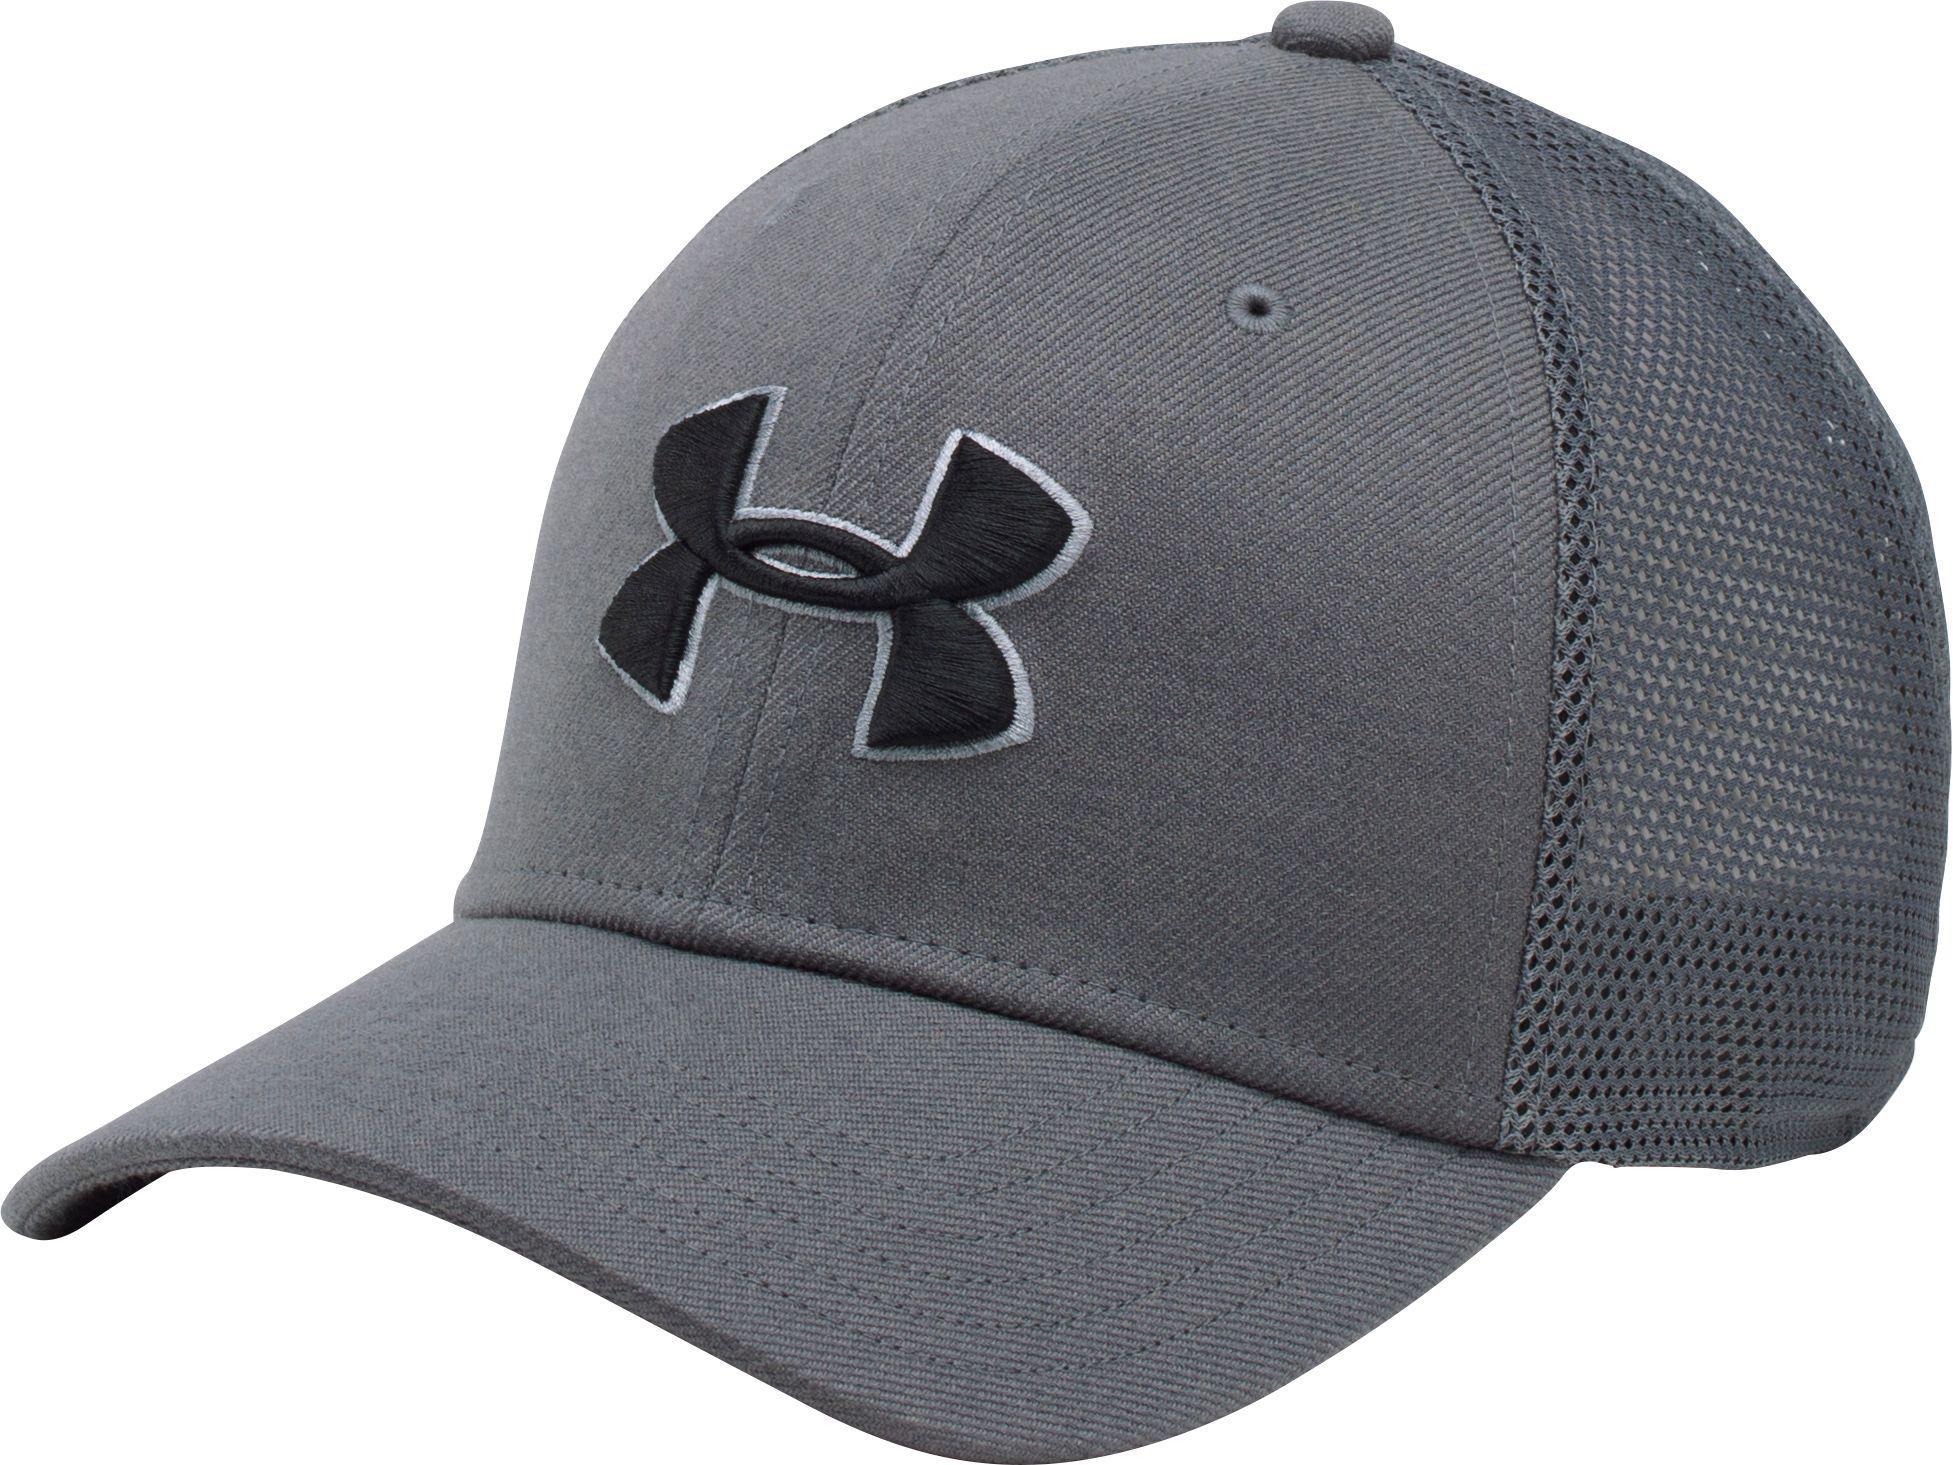 Lyst - Under Armour Closer Trucker Hat for Men f22c693a5580